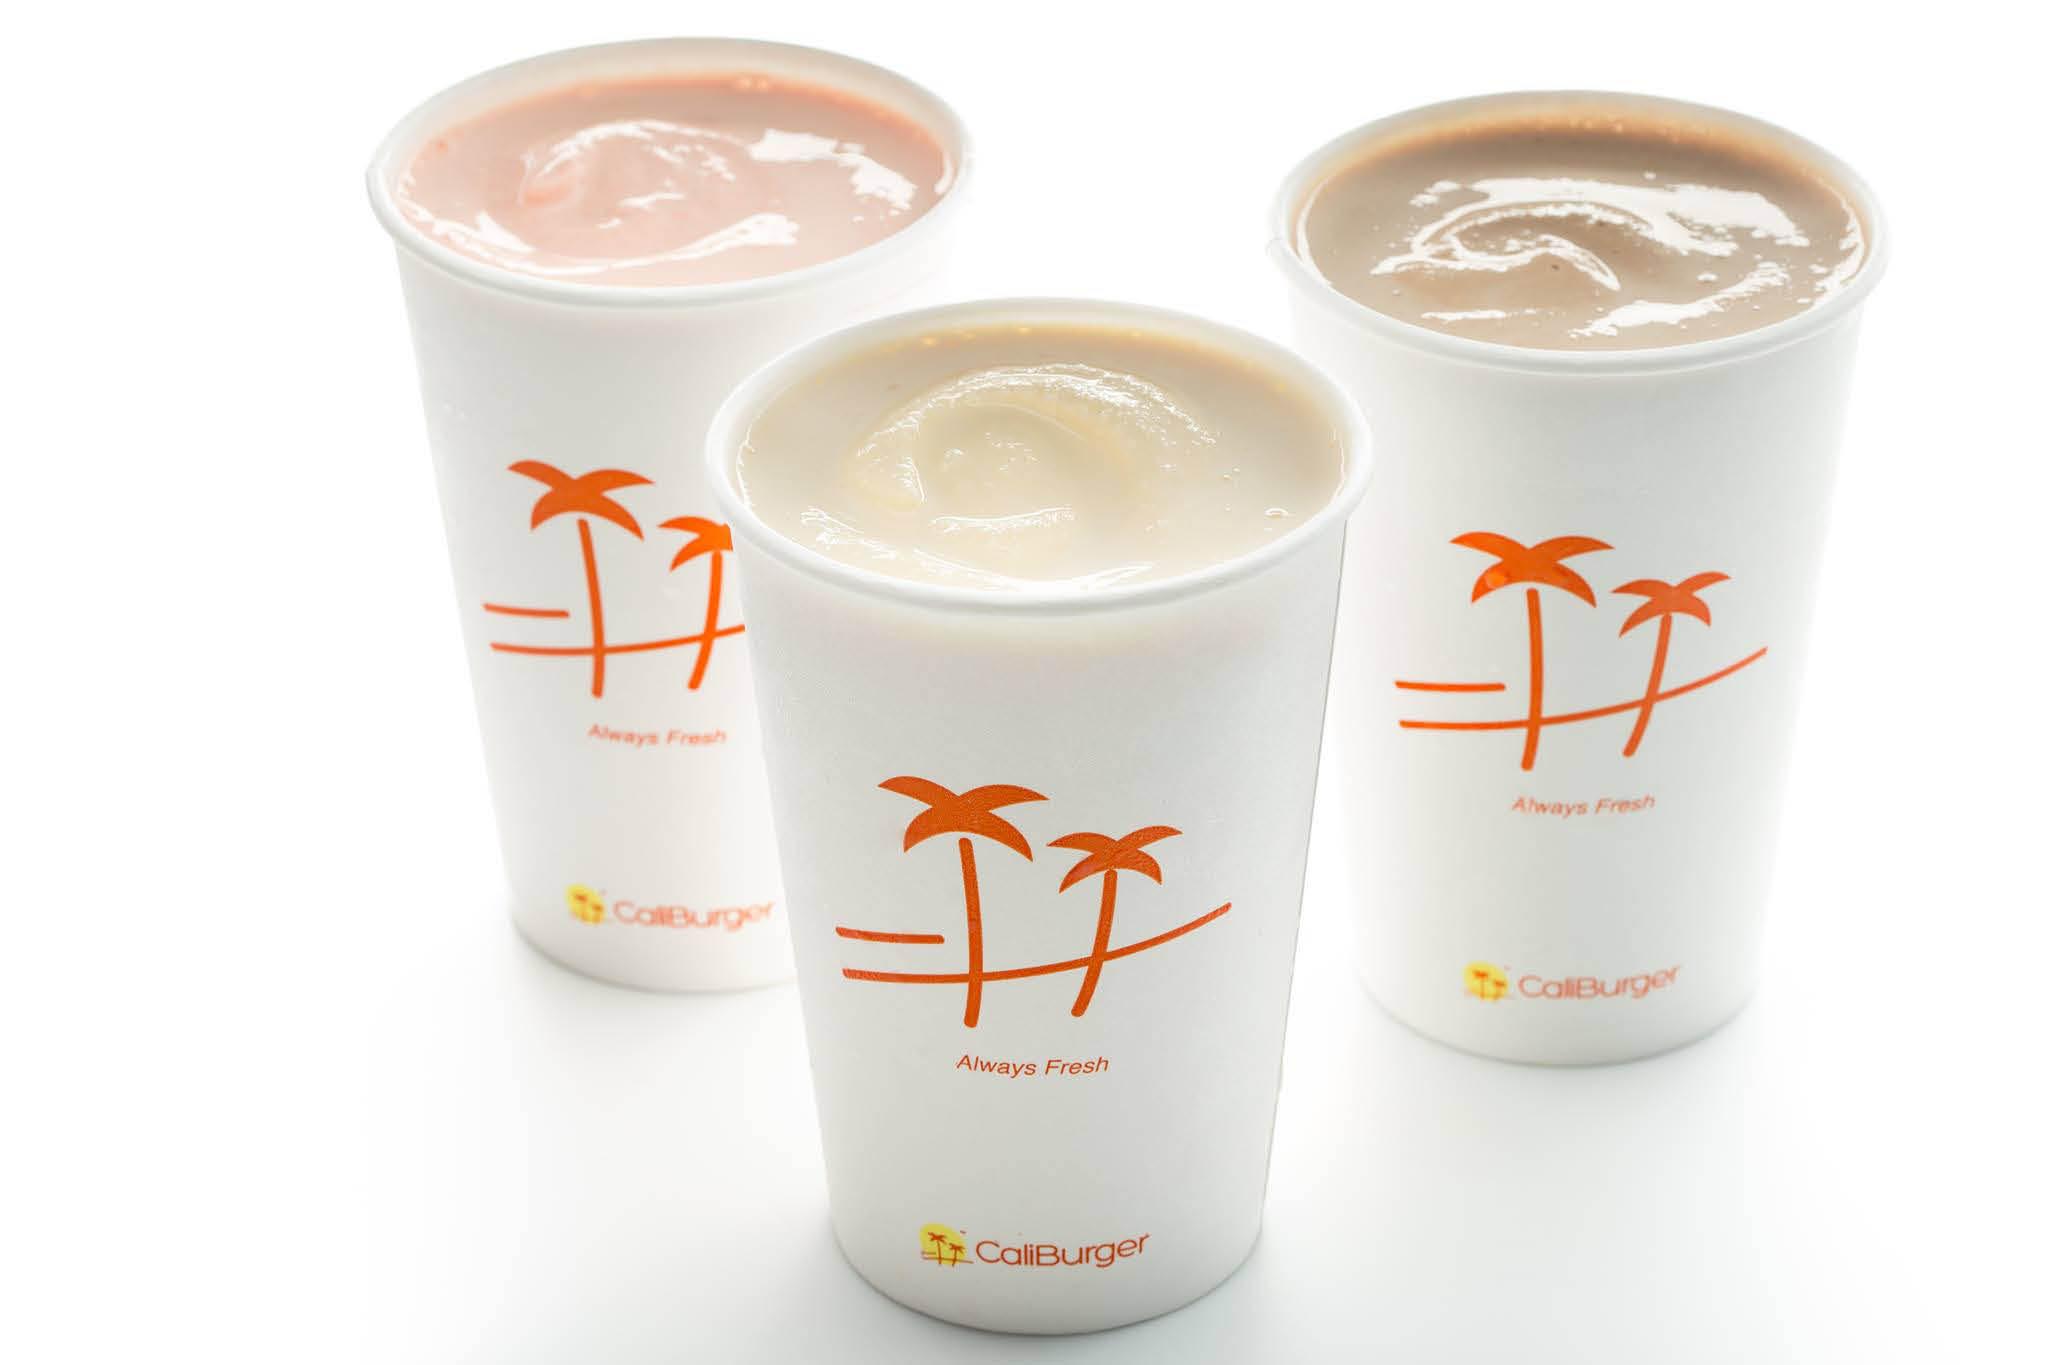 Caliburger Seattle - refreshing milkshakes are handspun & made with rich creamy ice cream & fresh milk